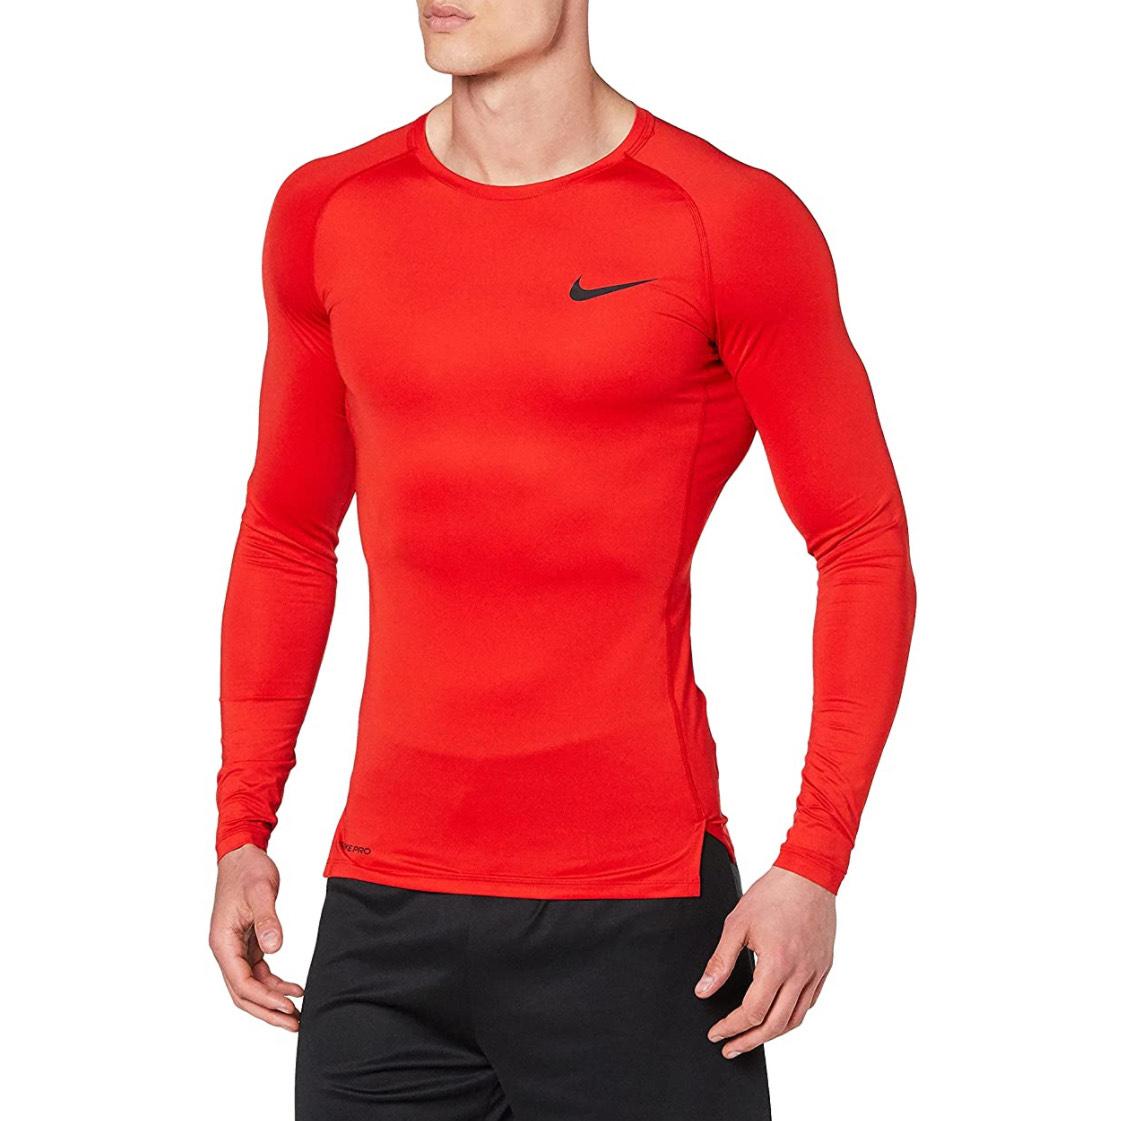 Camiseta ajustada NIKE hombre talla XL.